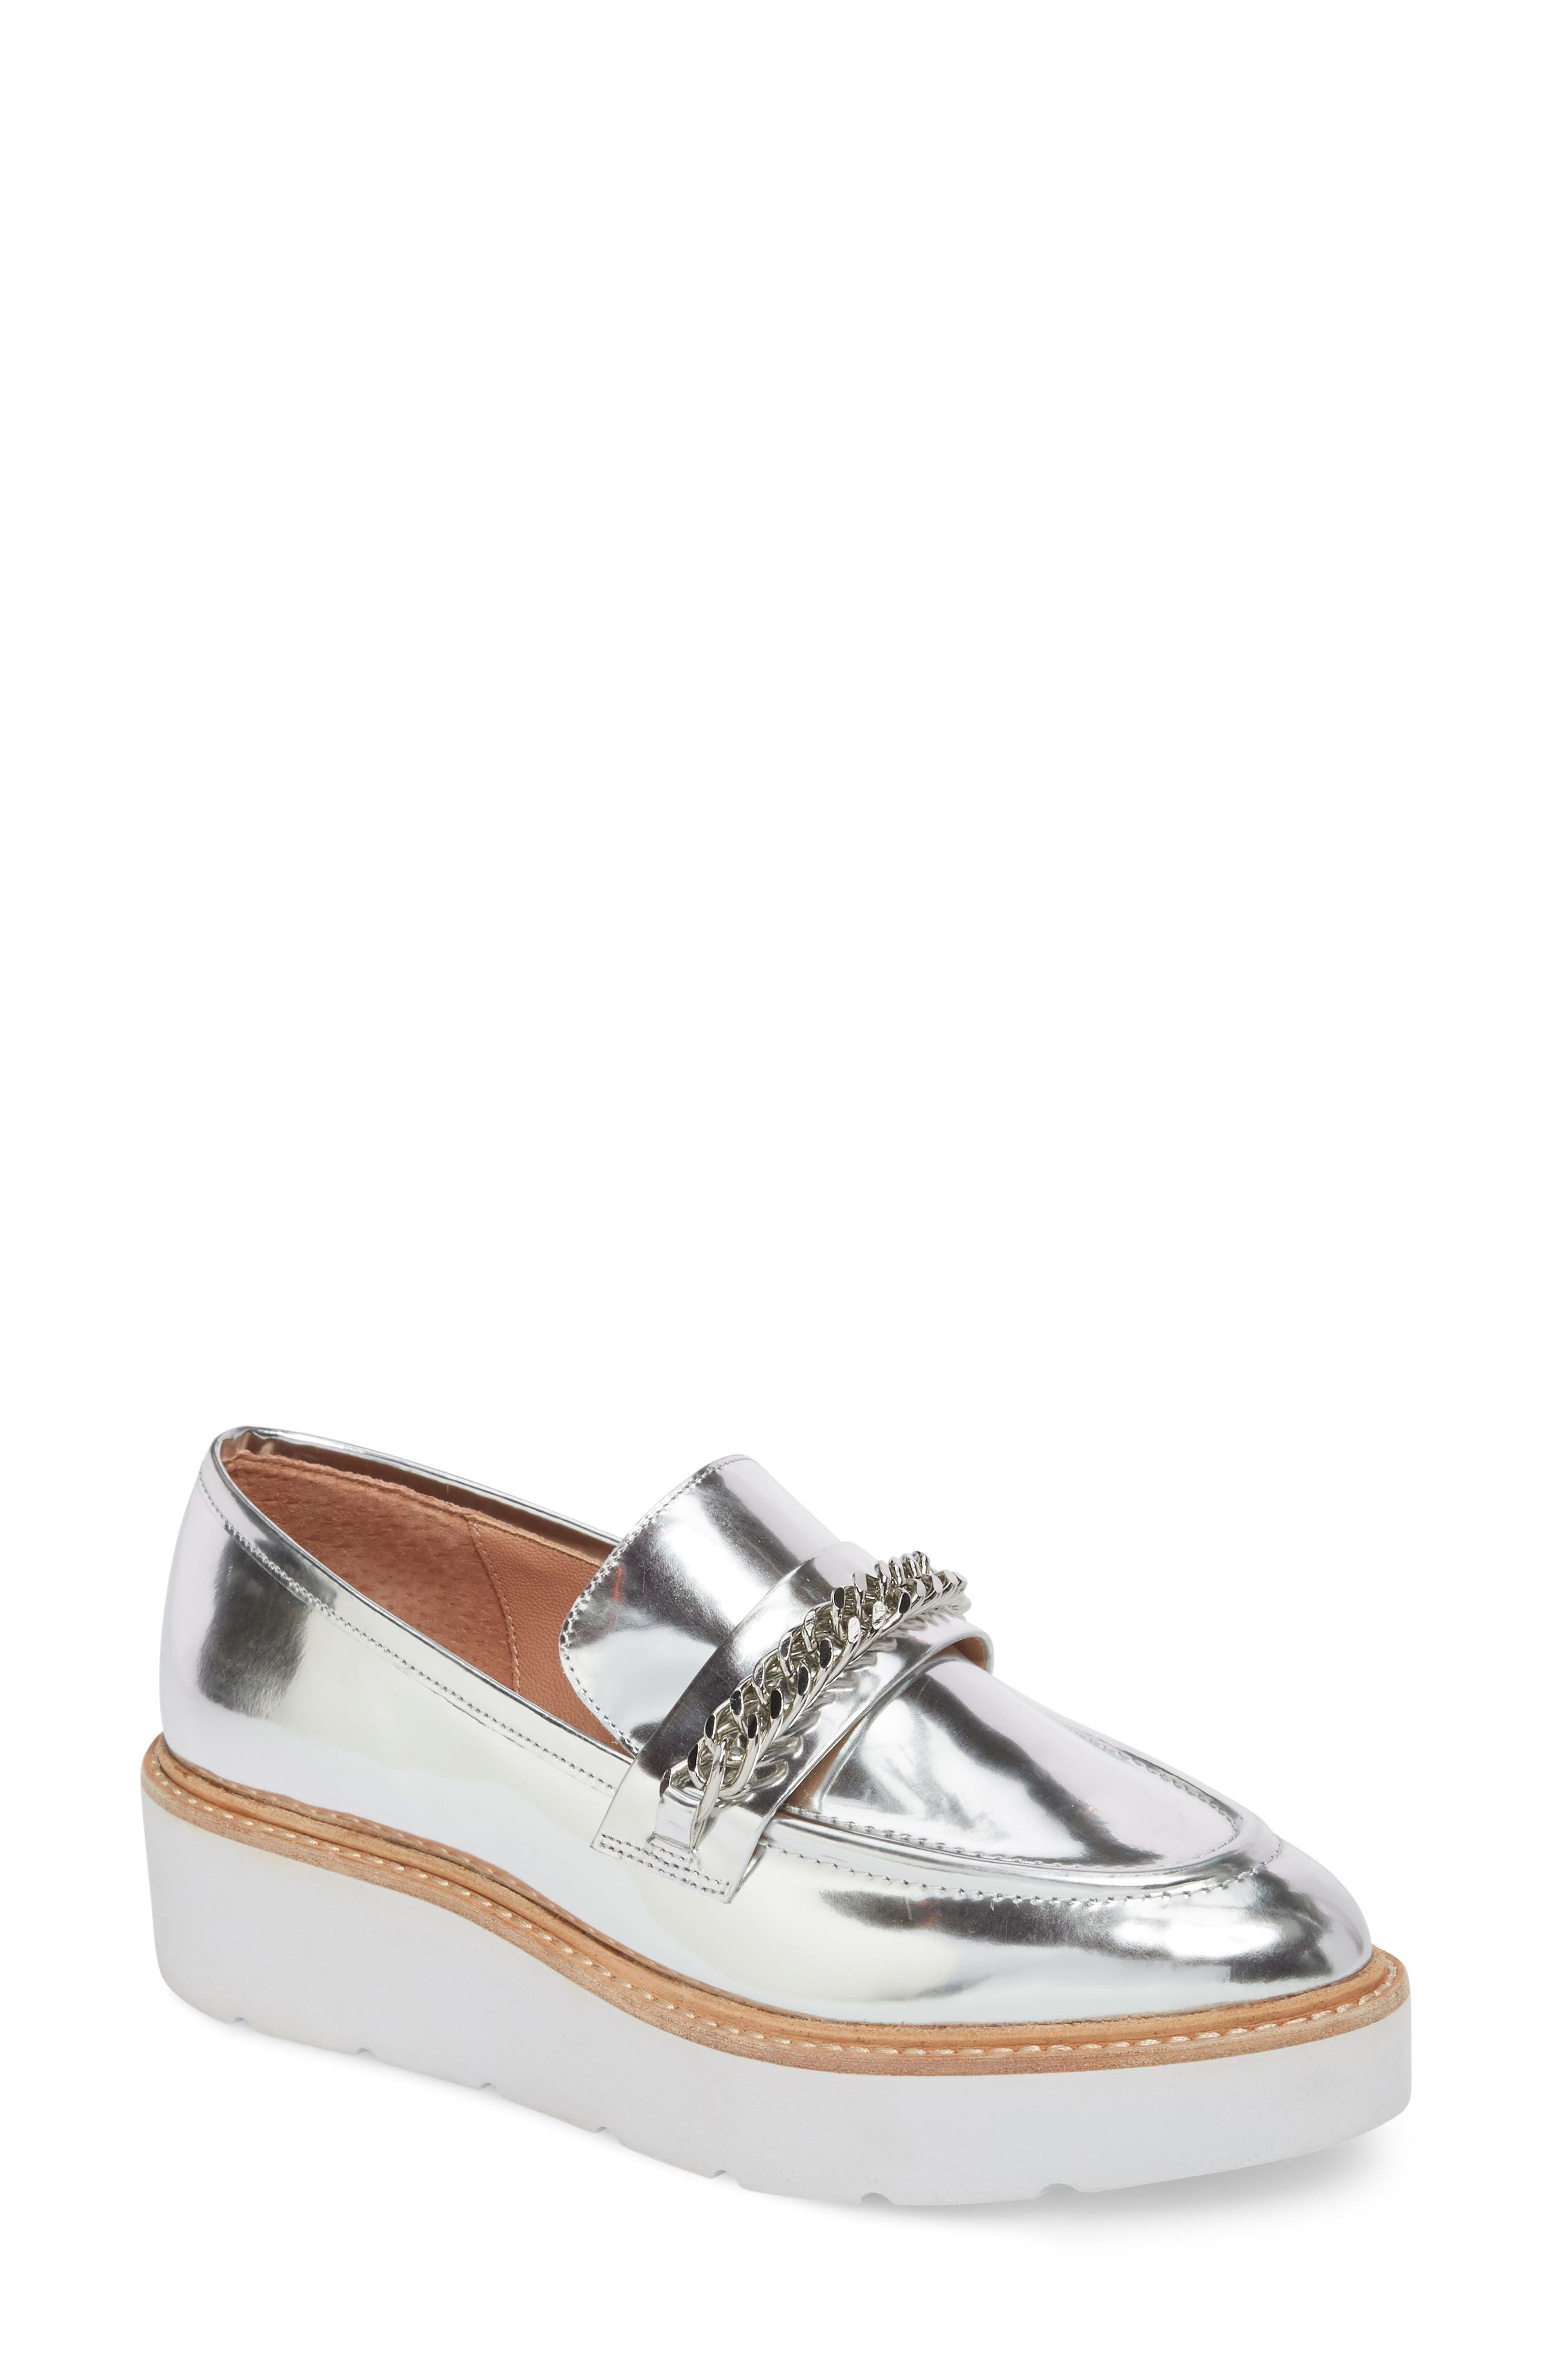 Jacki Platform Loafer,                             Main thumbnail 1, color,                             Silver Leather